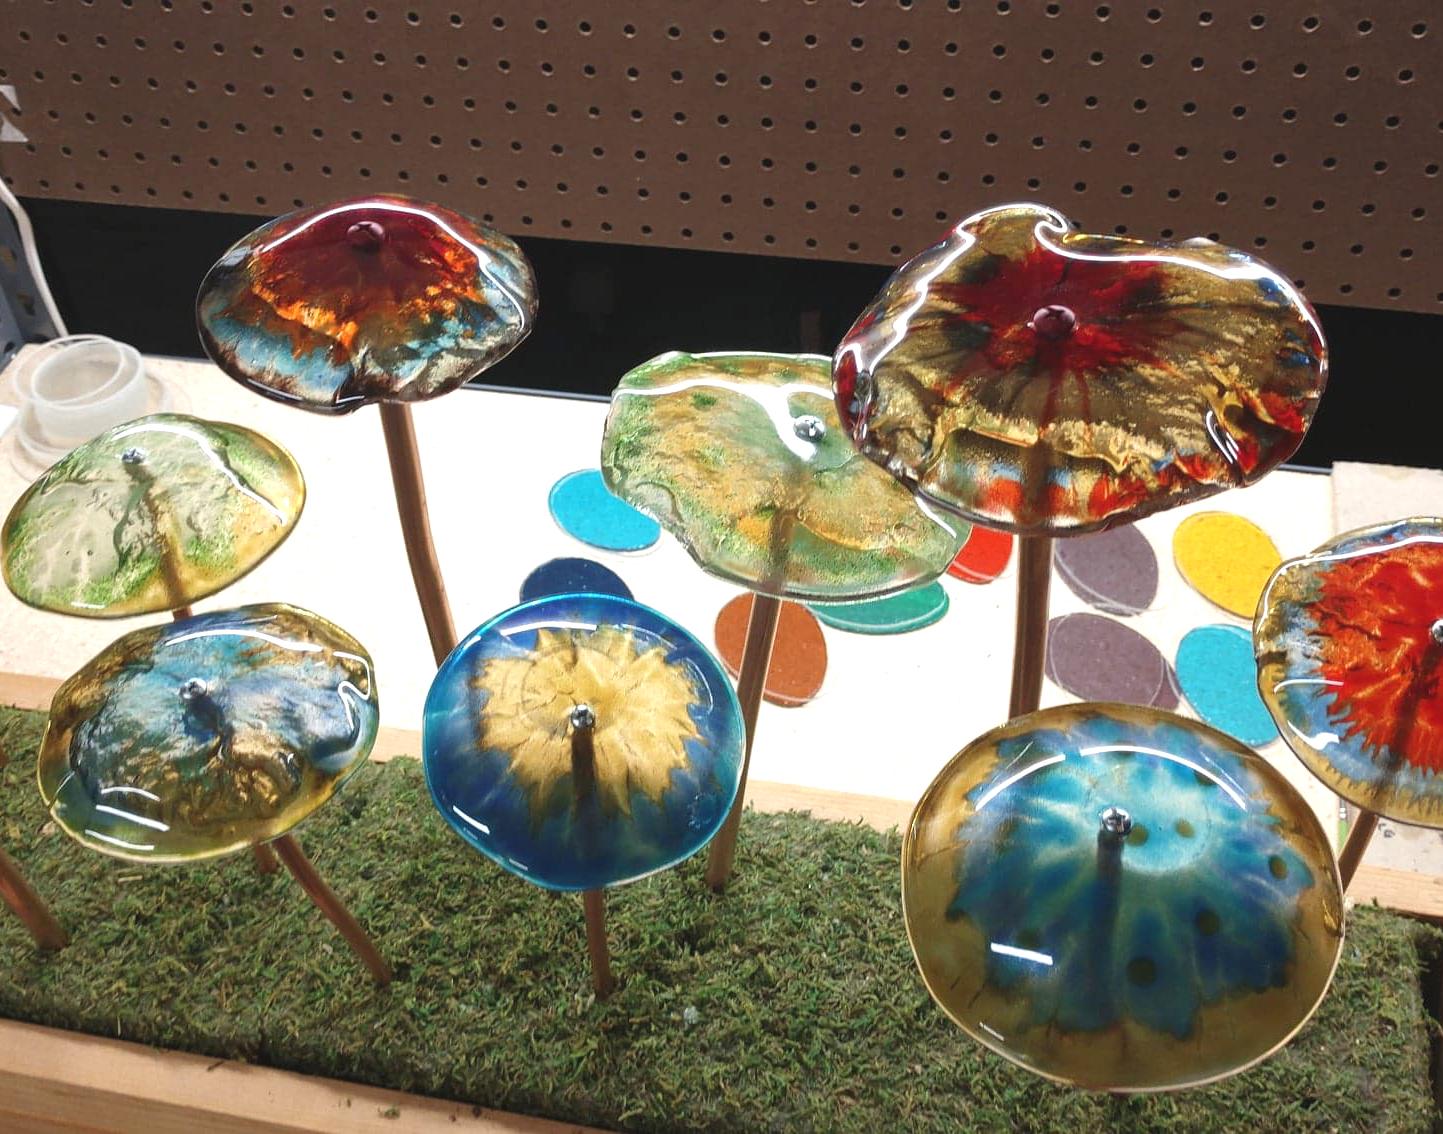 Glass Mushrooms Group Horizontal crop.jpg